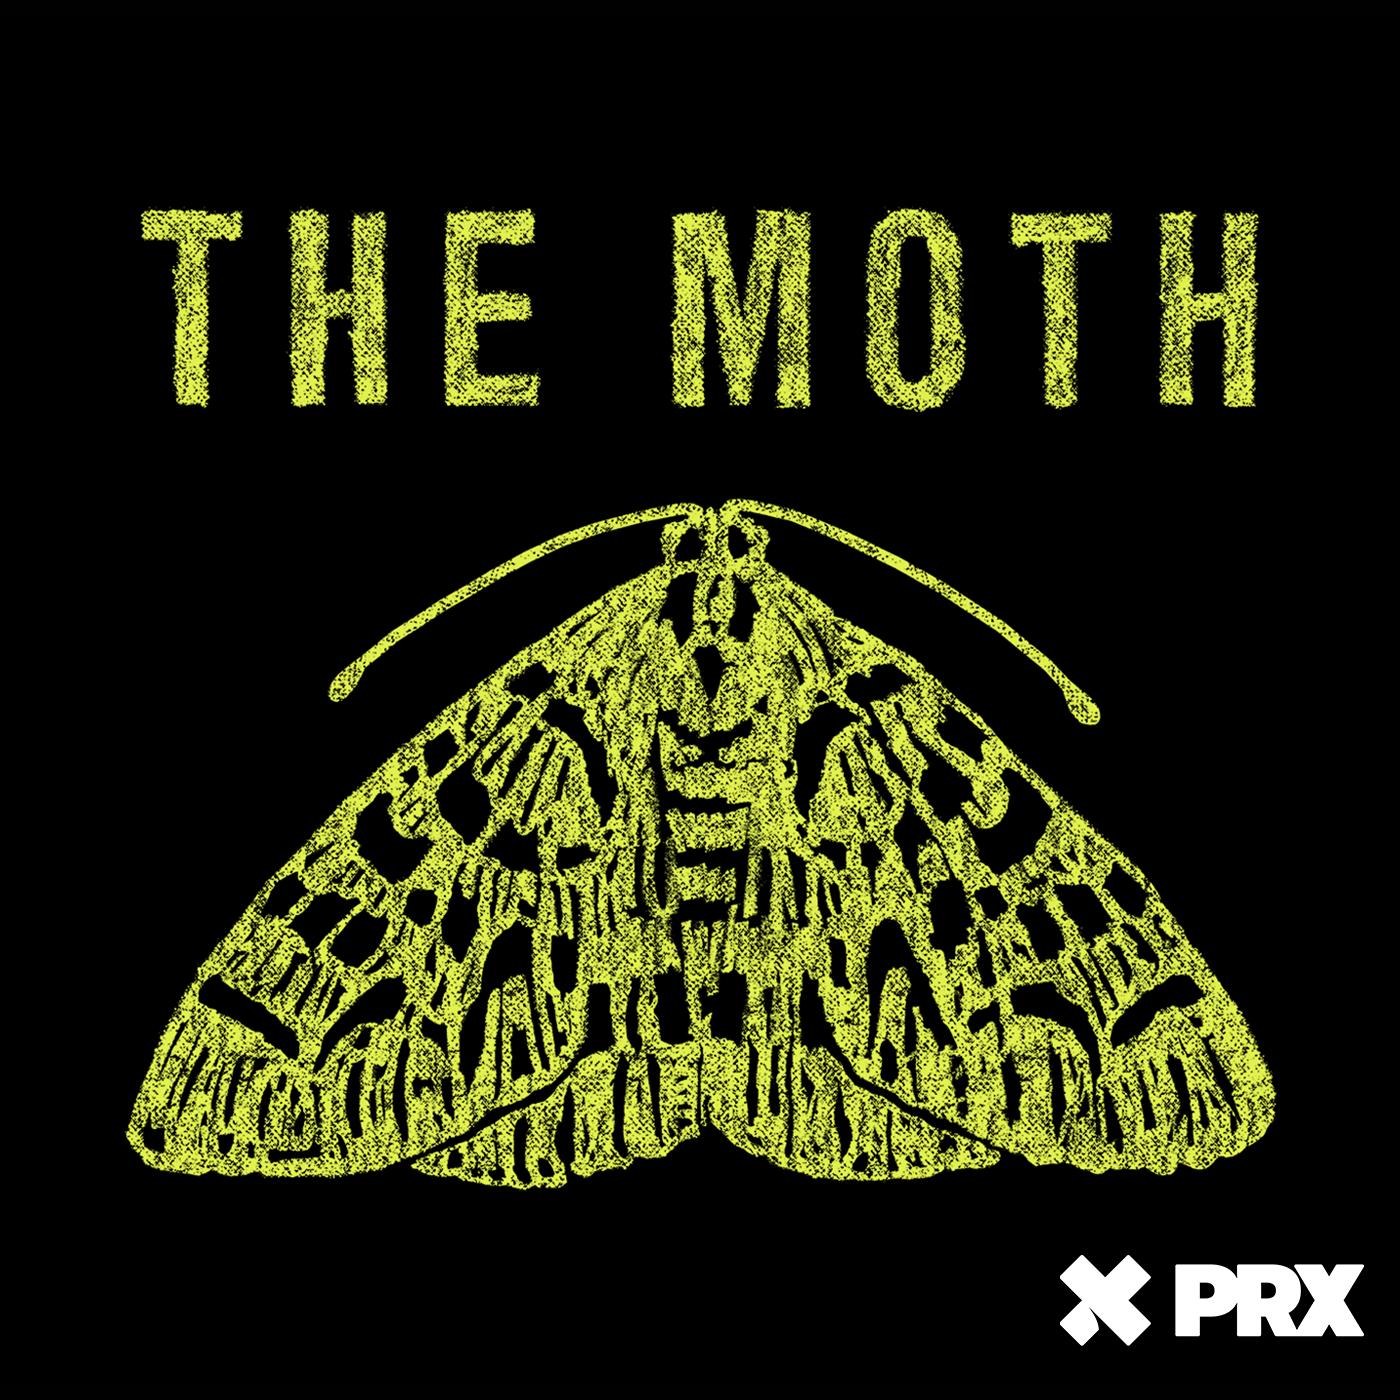 The Moth Radio Hour: Millionaire Hot Seat, Monkey, Assassin